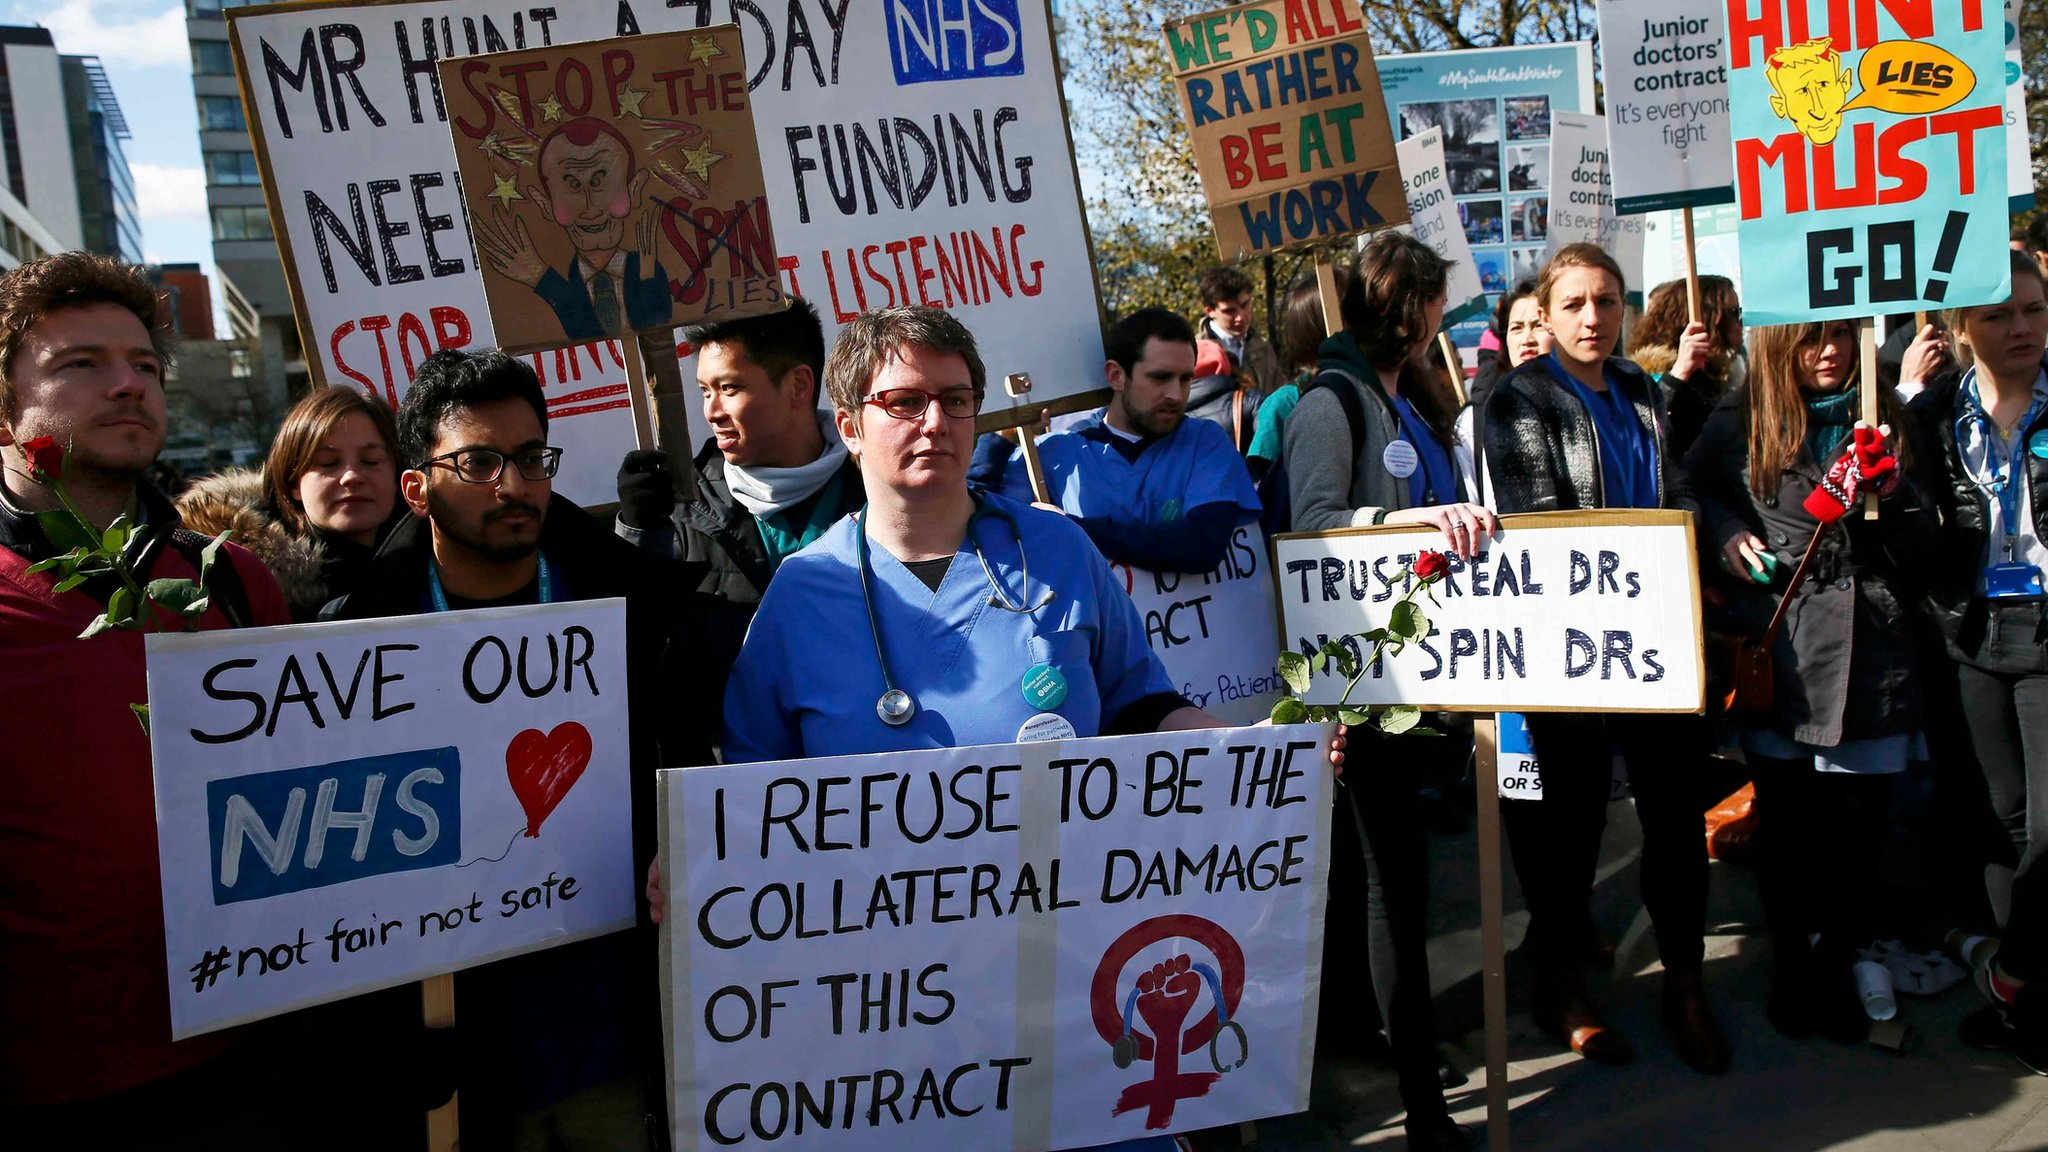 Junior doctors plan week of all-out strikes